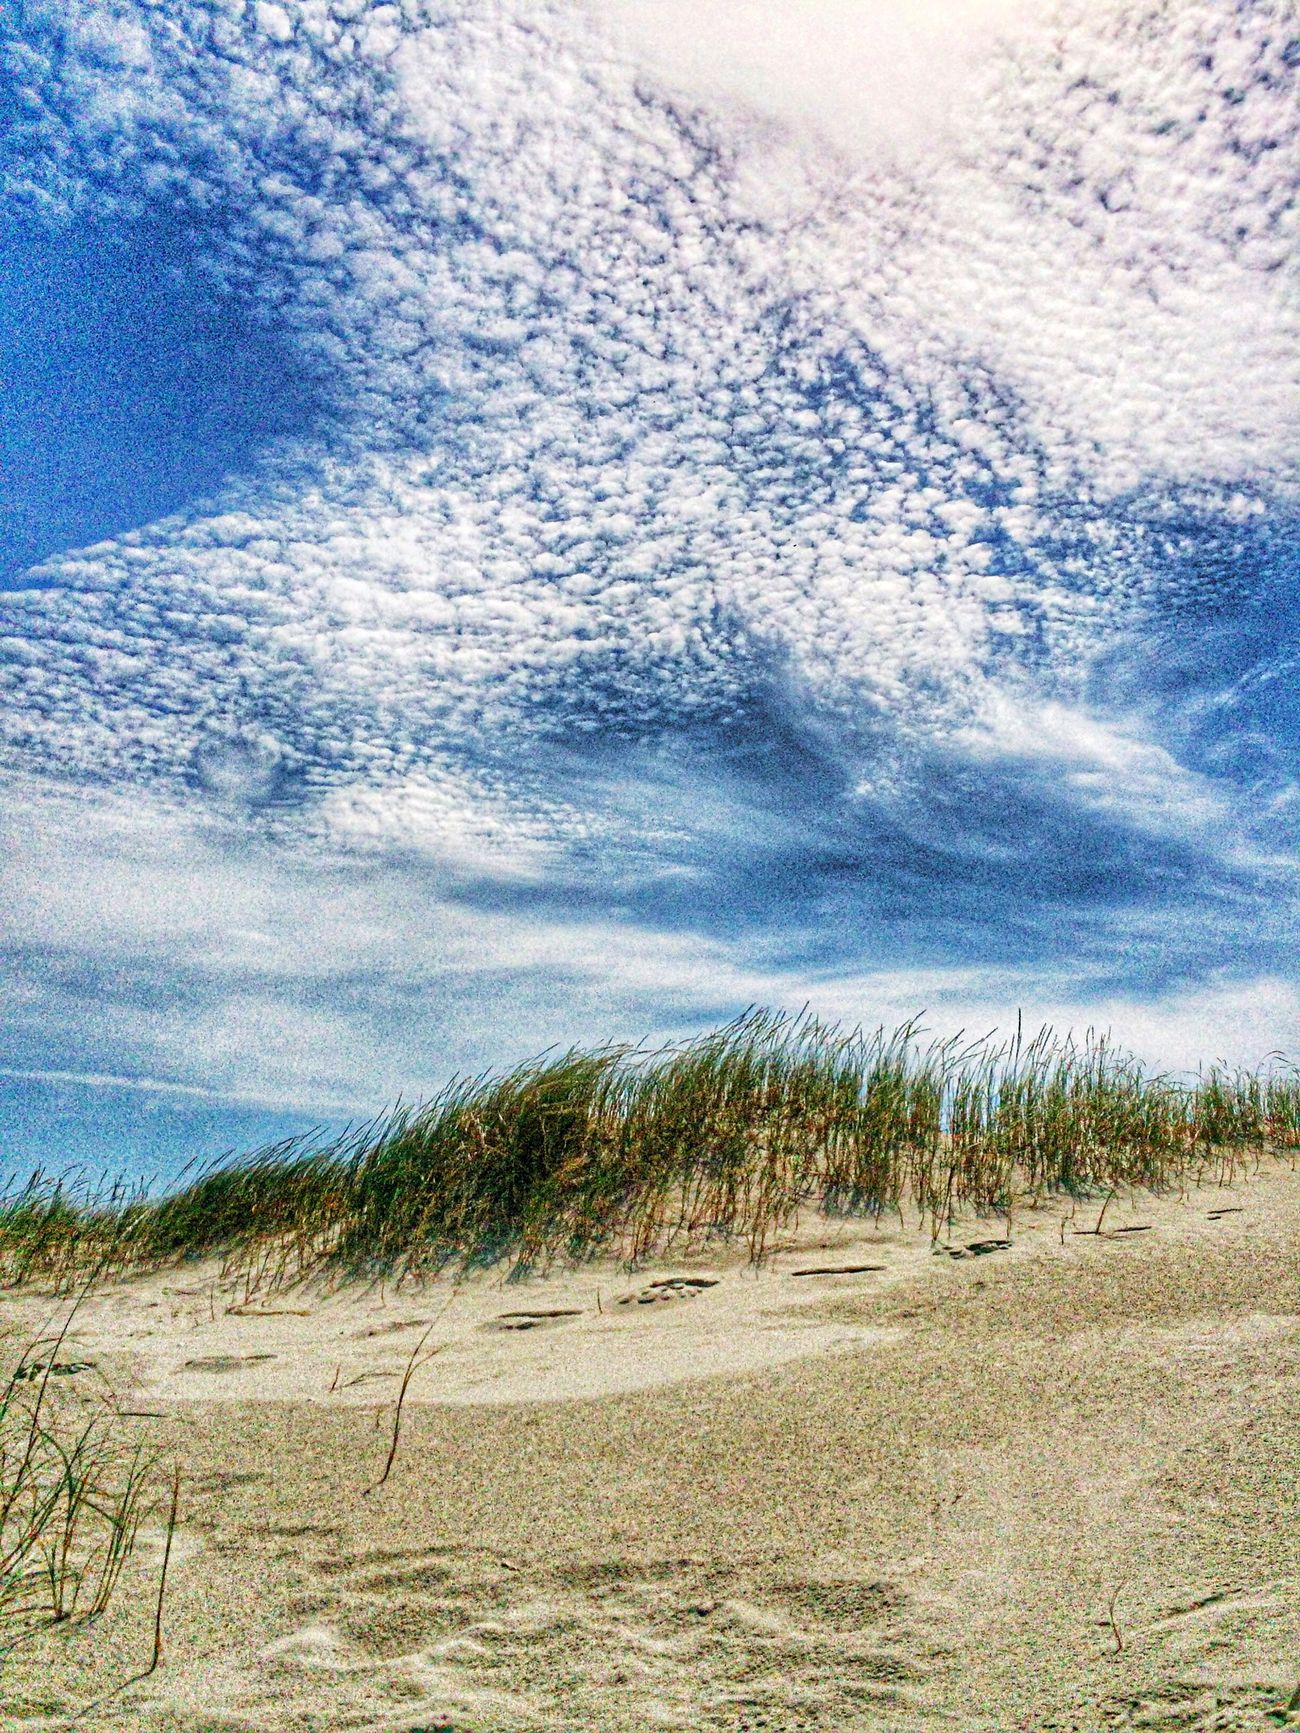 Taking Photos Dunes Summertime Nature